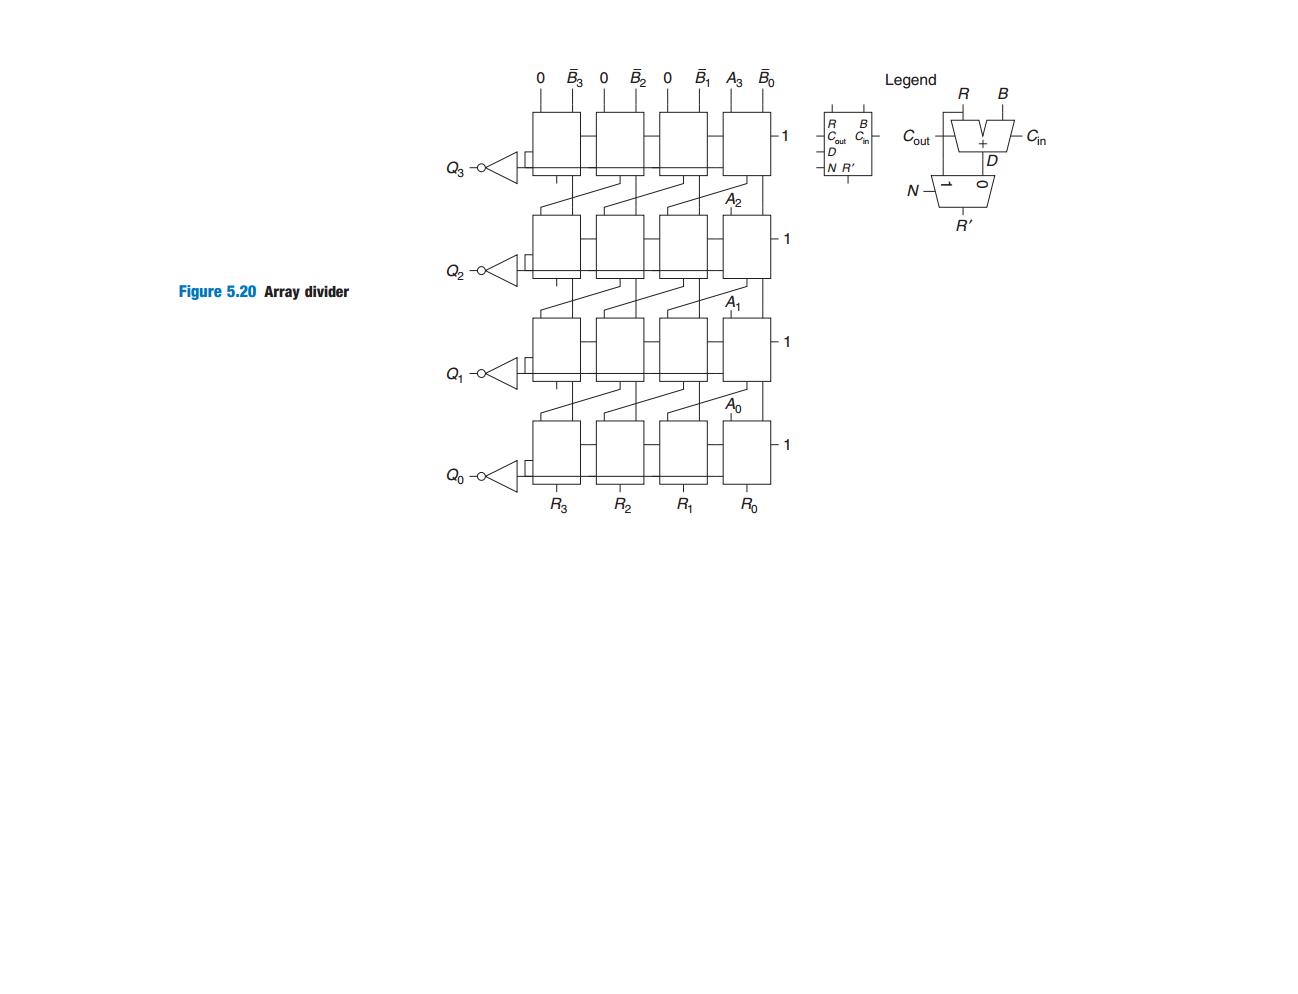 Building Blocks For Digital Architectures Vuongbkdn